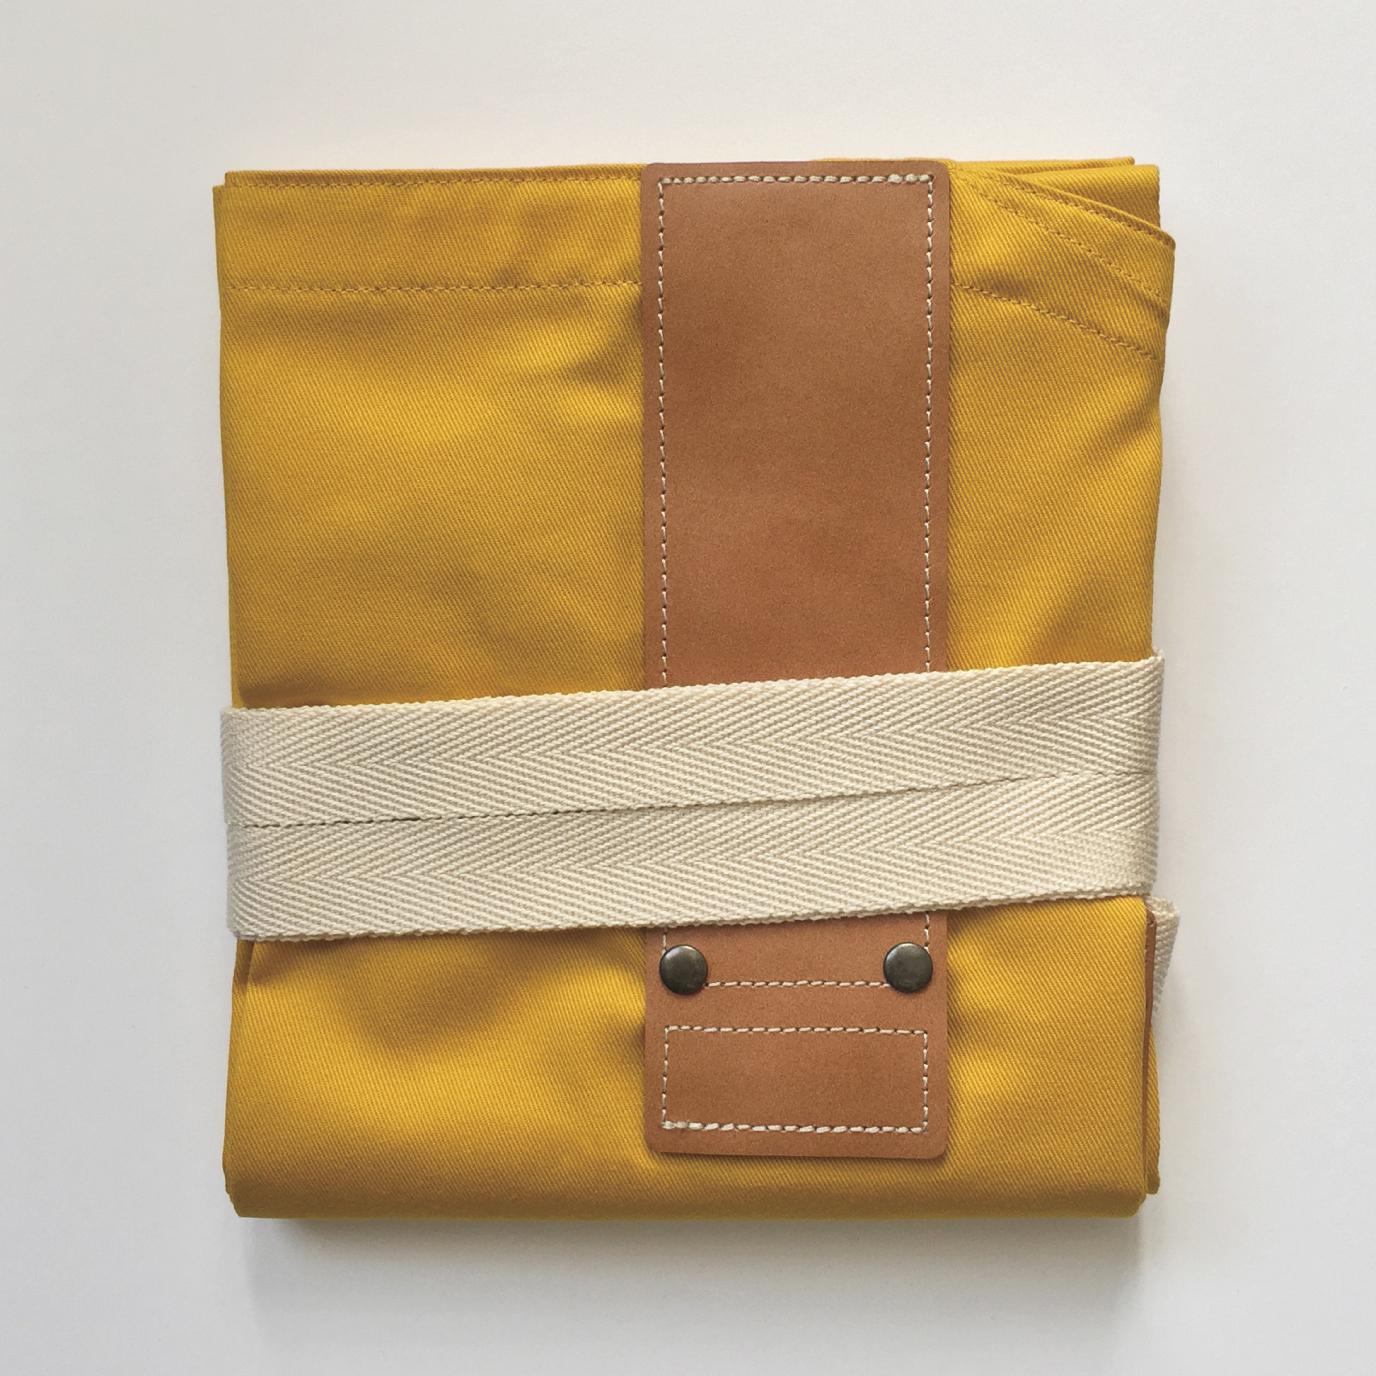 MUSTARDxBROWN HASHIRA-JYU mitten pocket set